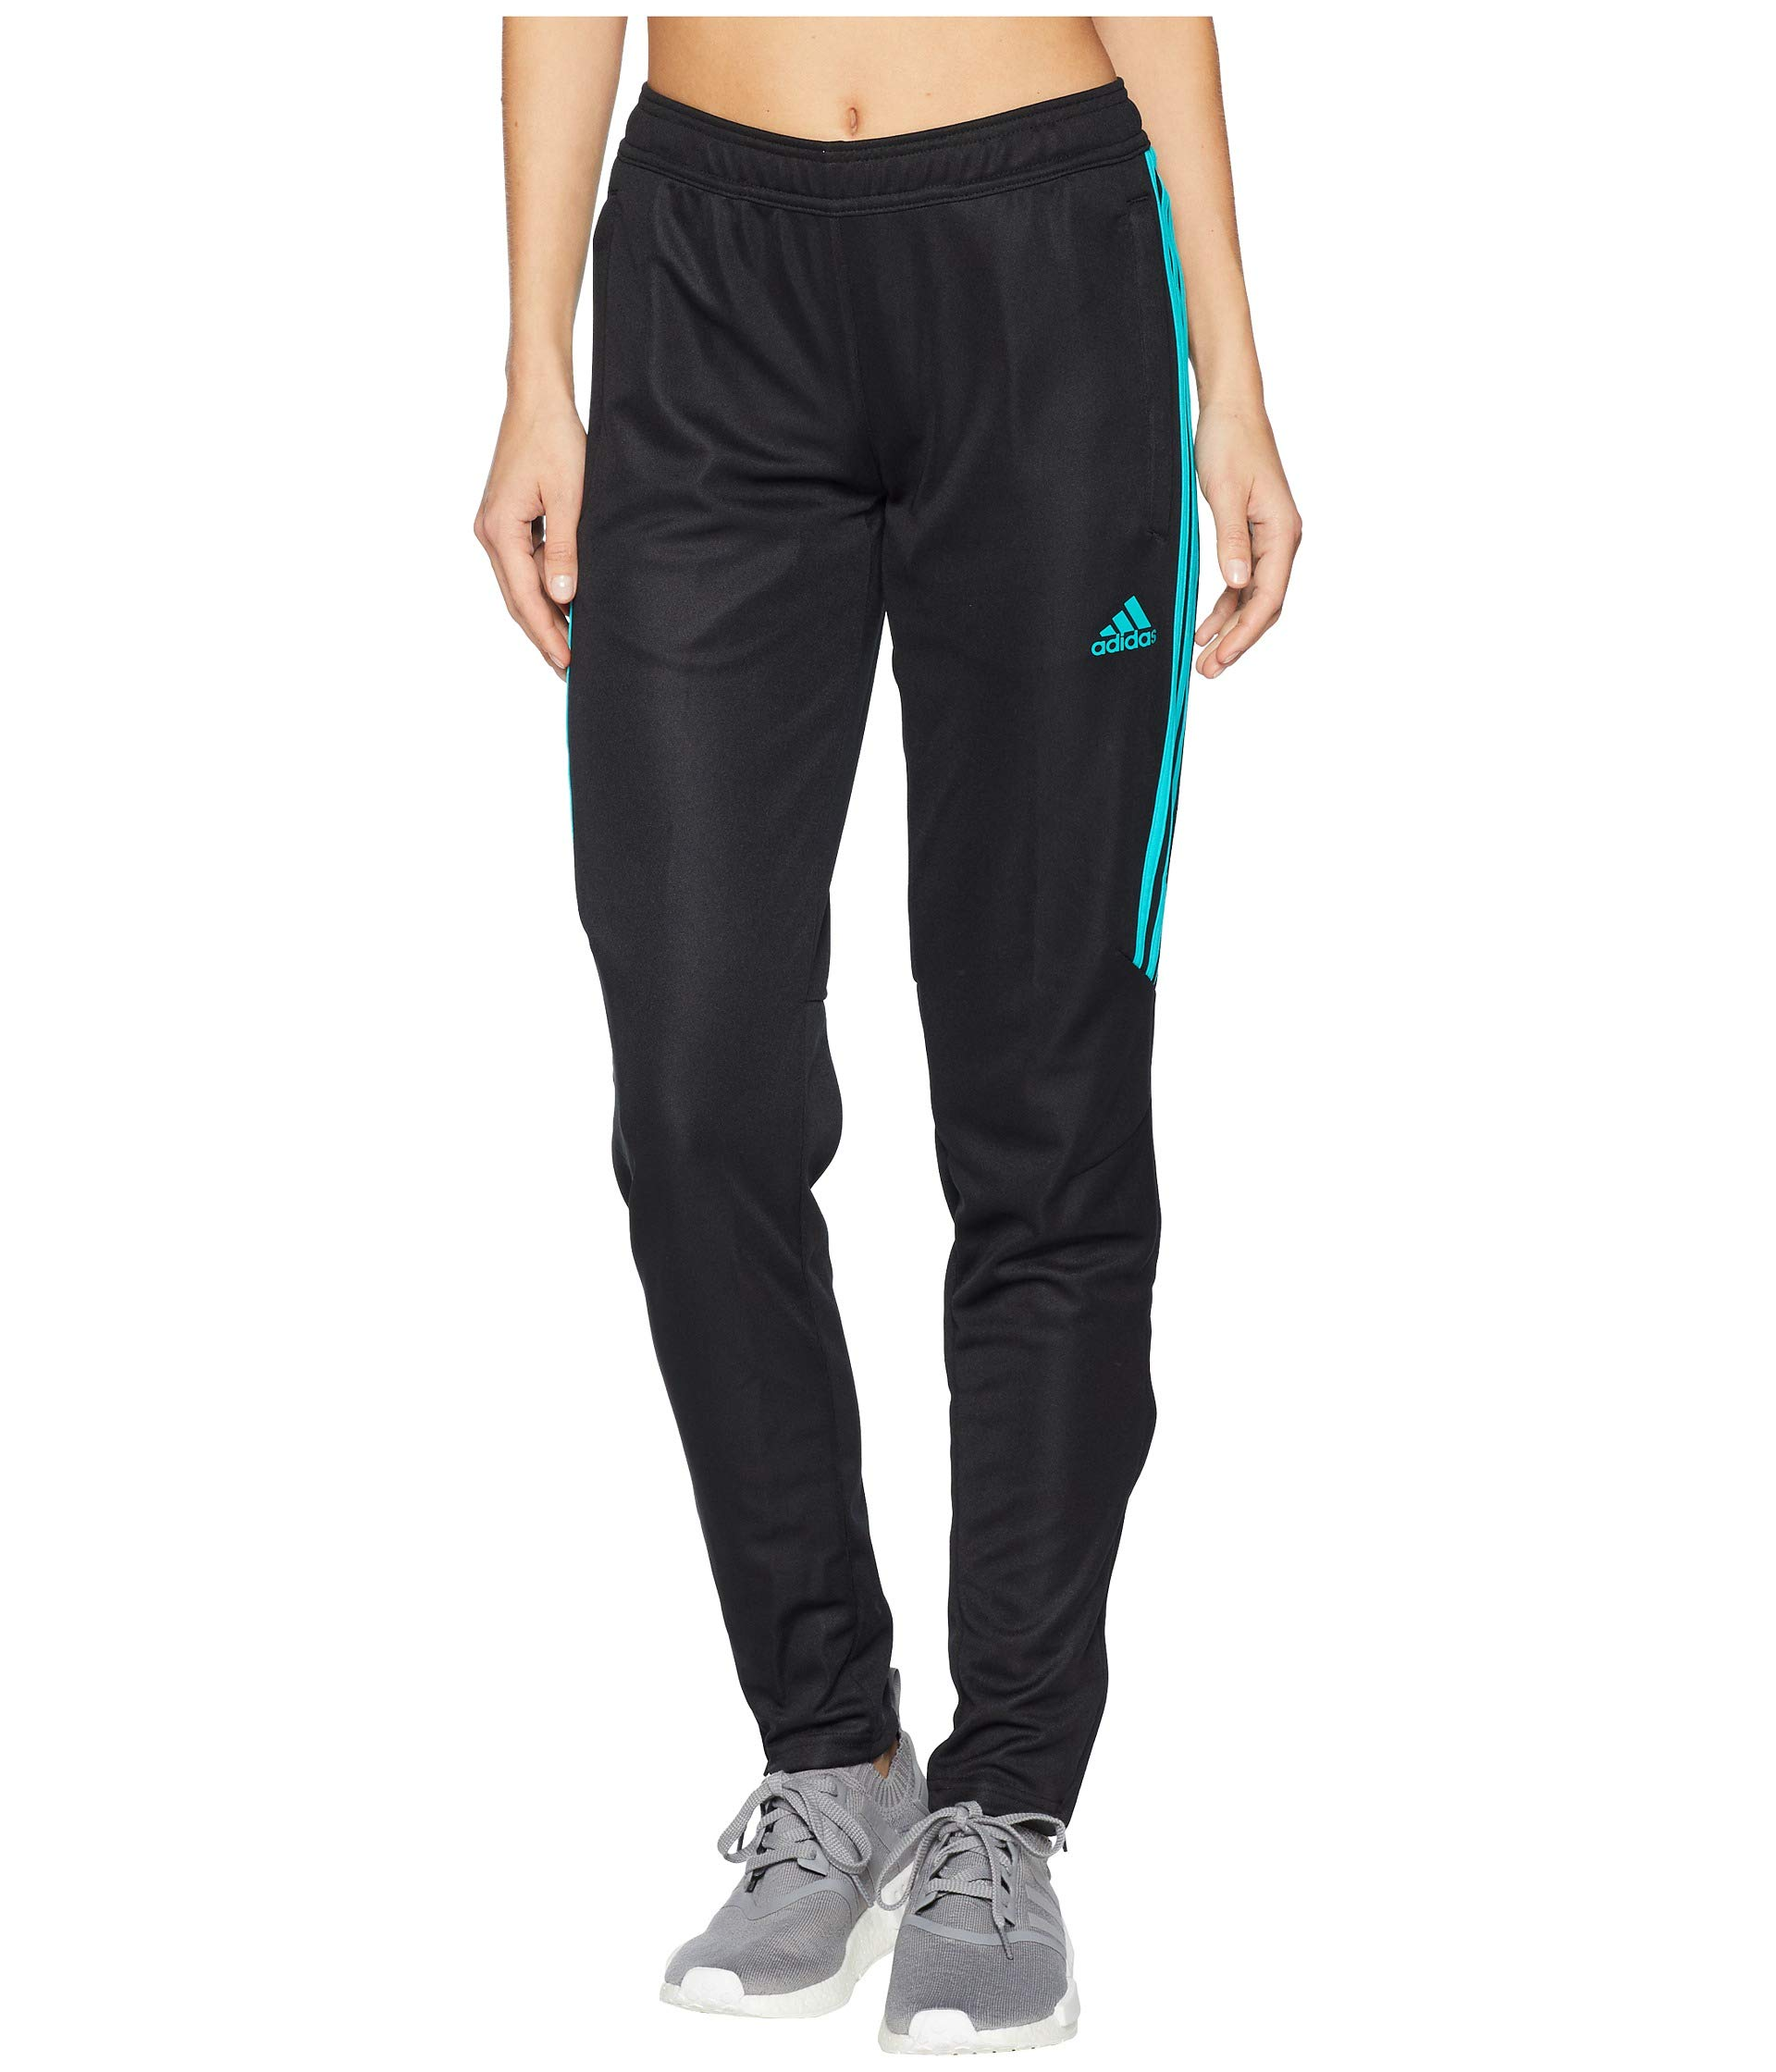 adidas Women's Tiro '17 Pants Black/Hi-Res Aqua X-Large 32 by adidas